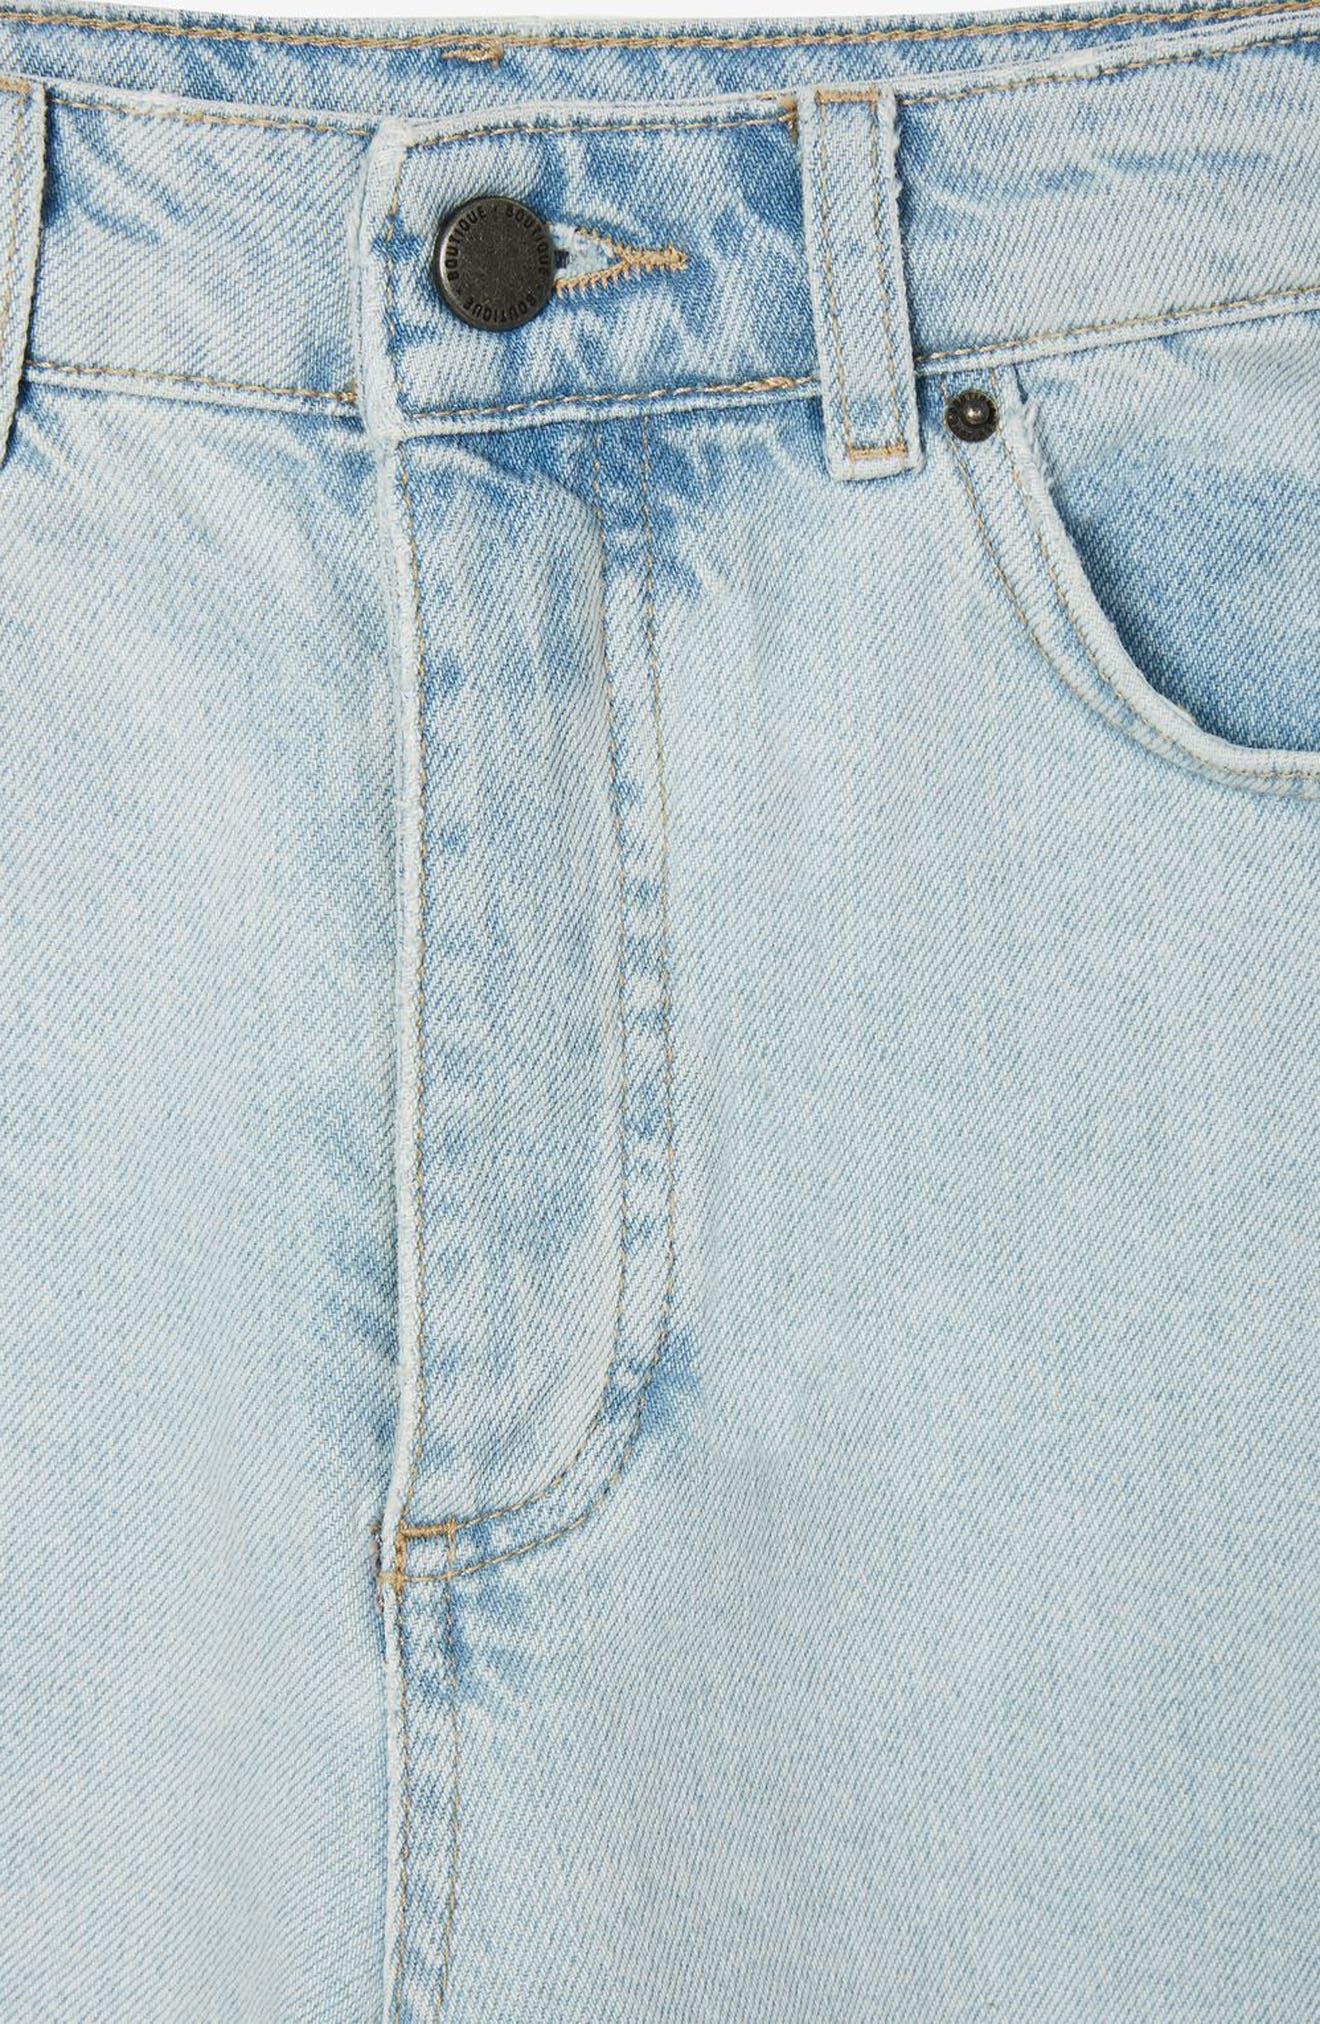 Bleach Denim Board Shorts,                             Alternate thumbnail 8, color,                             420